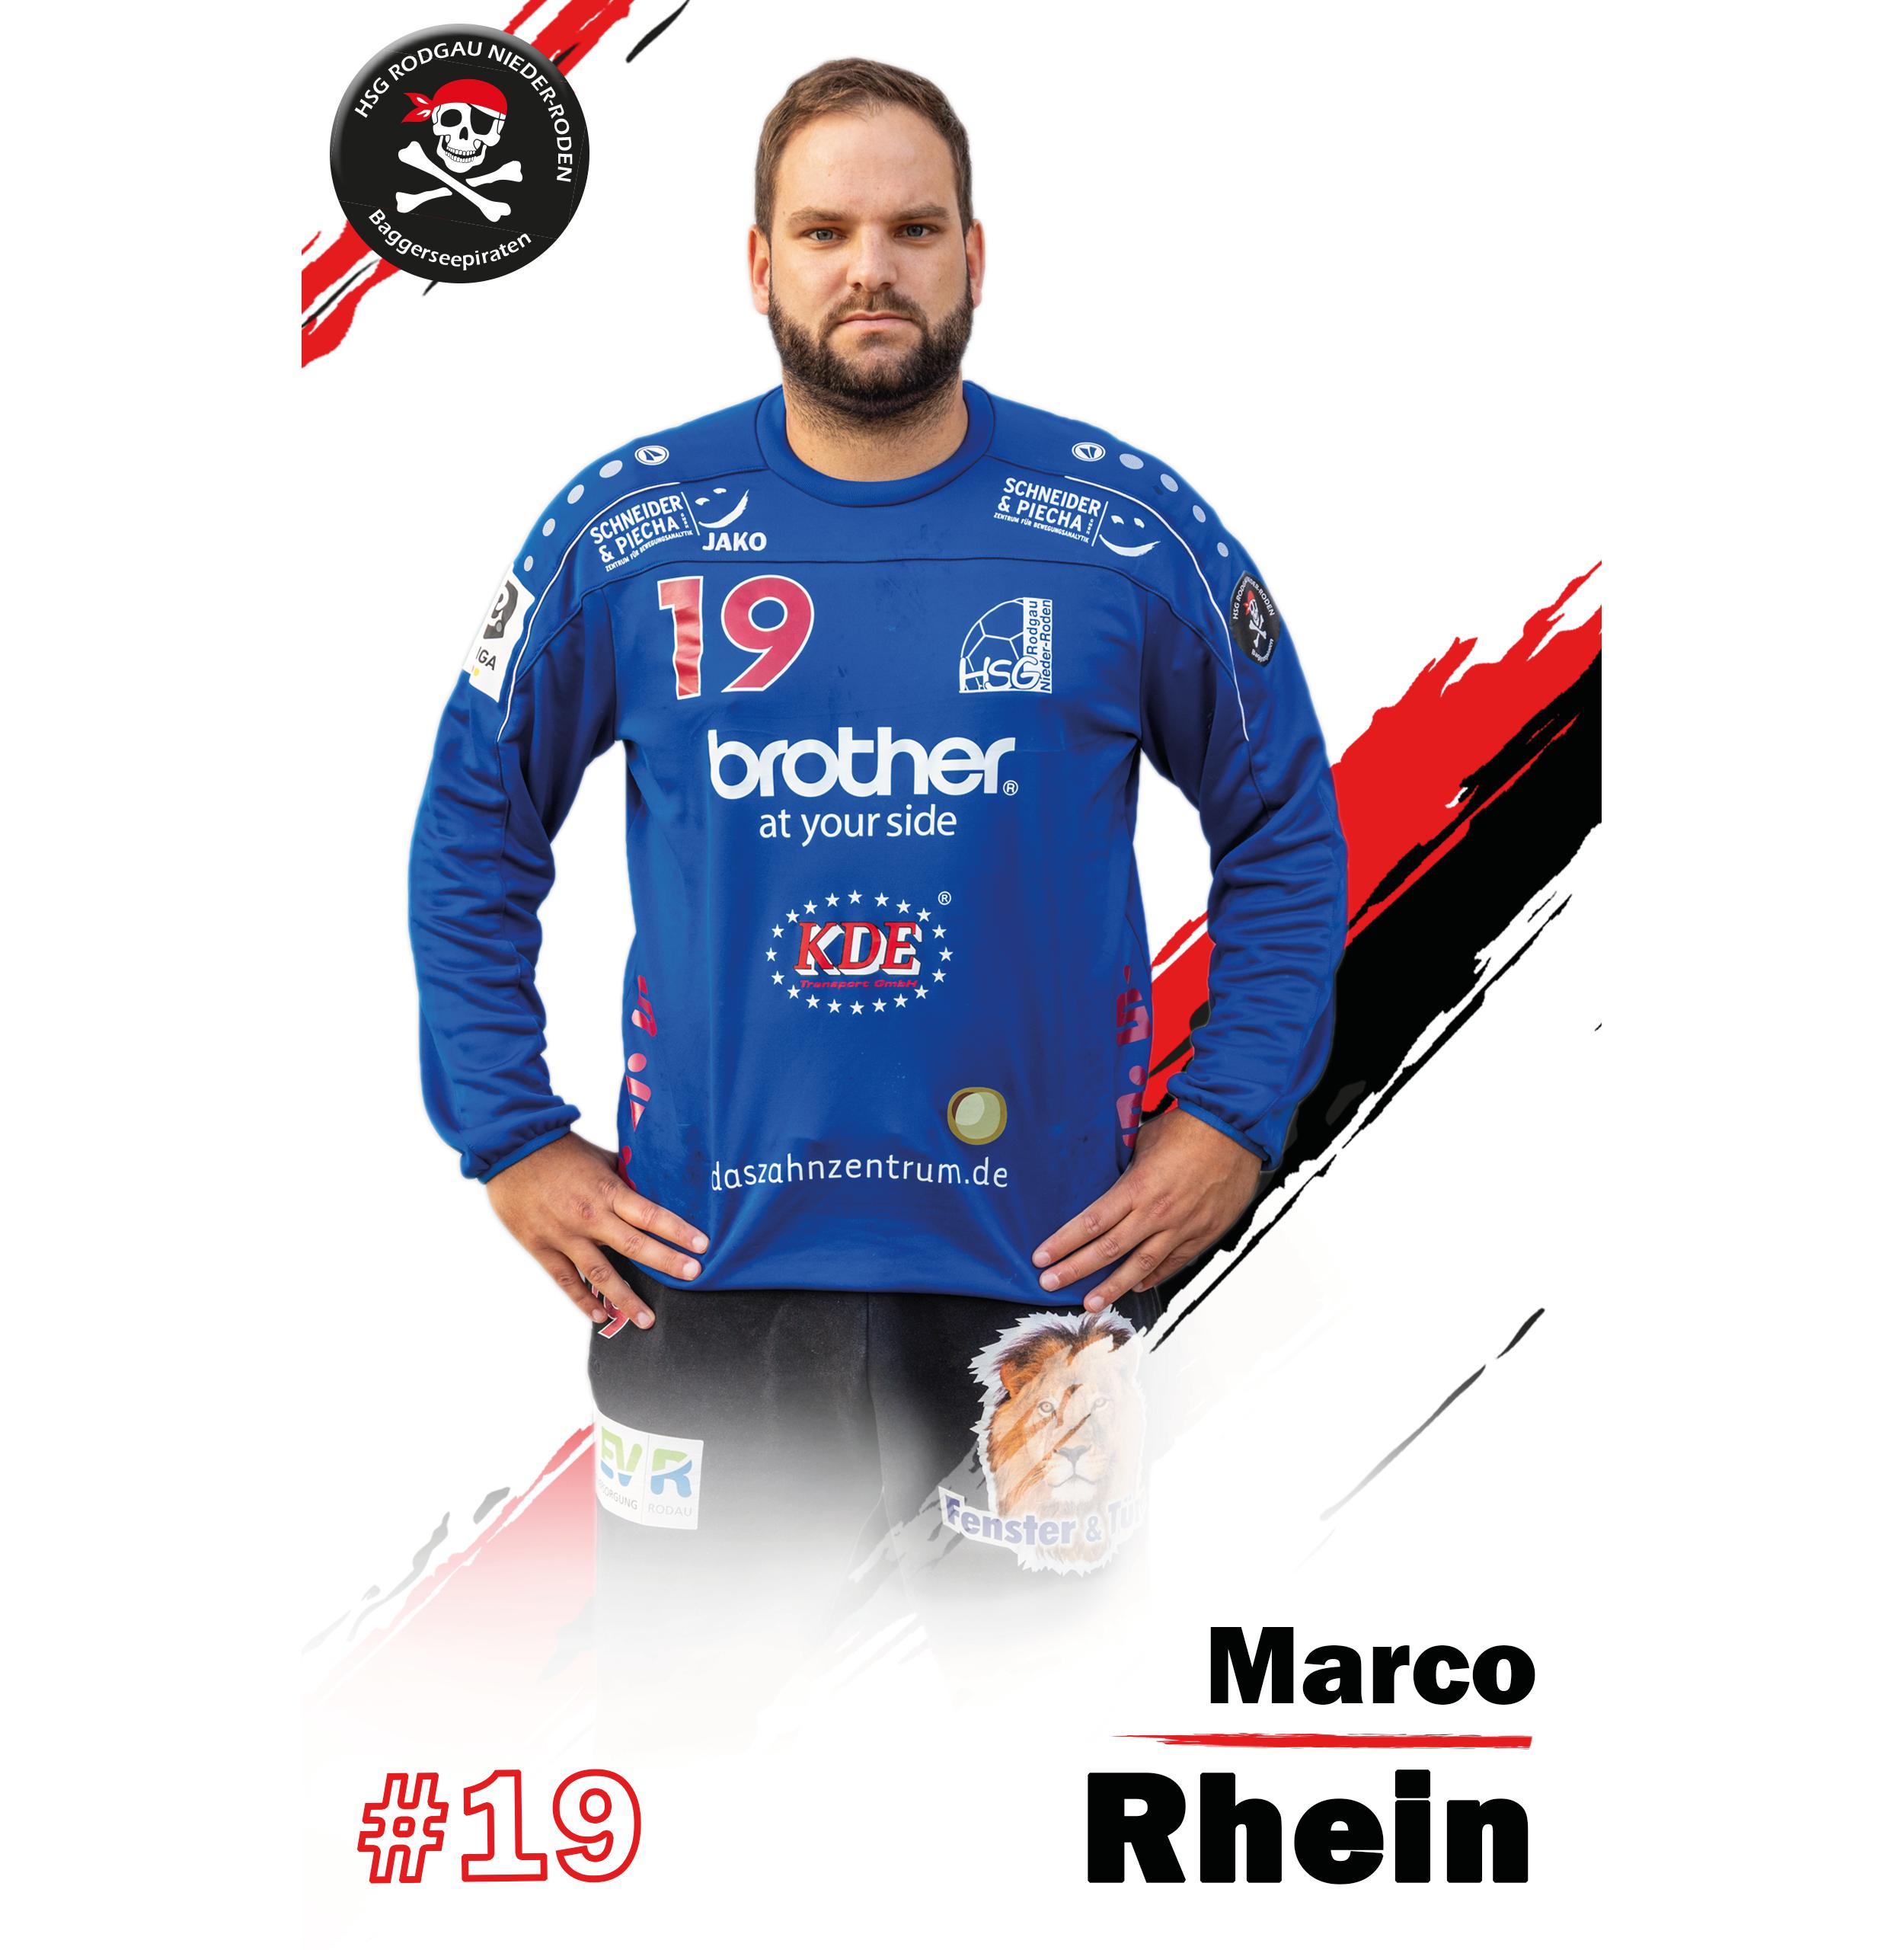 Marco Rhein